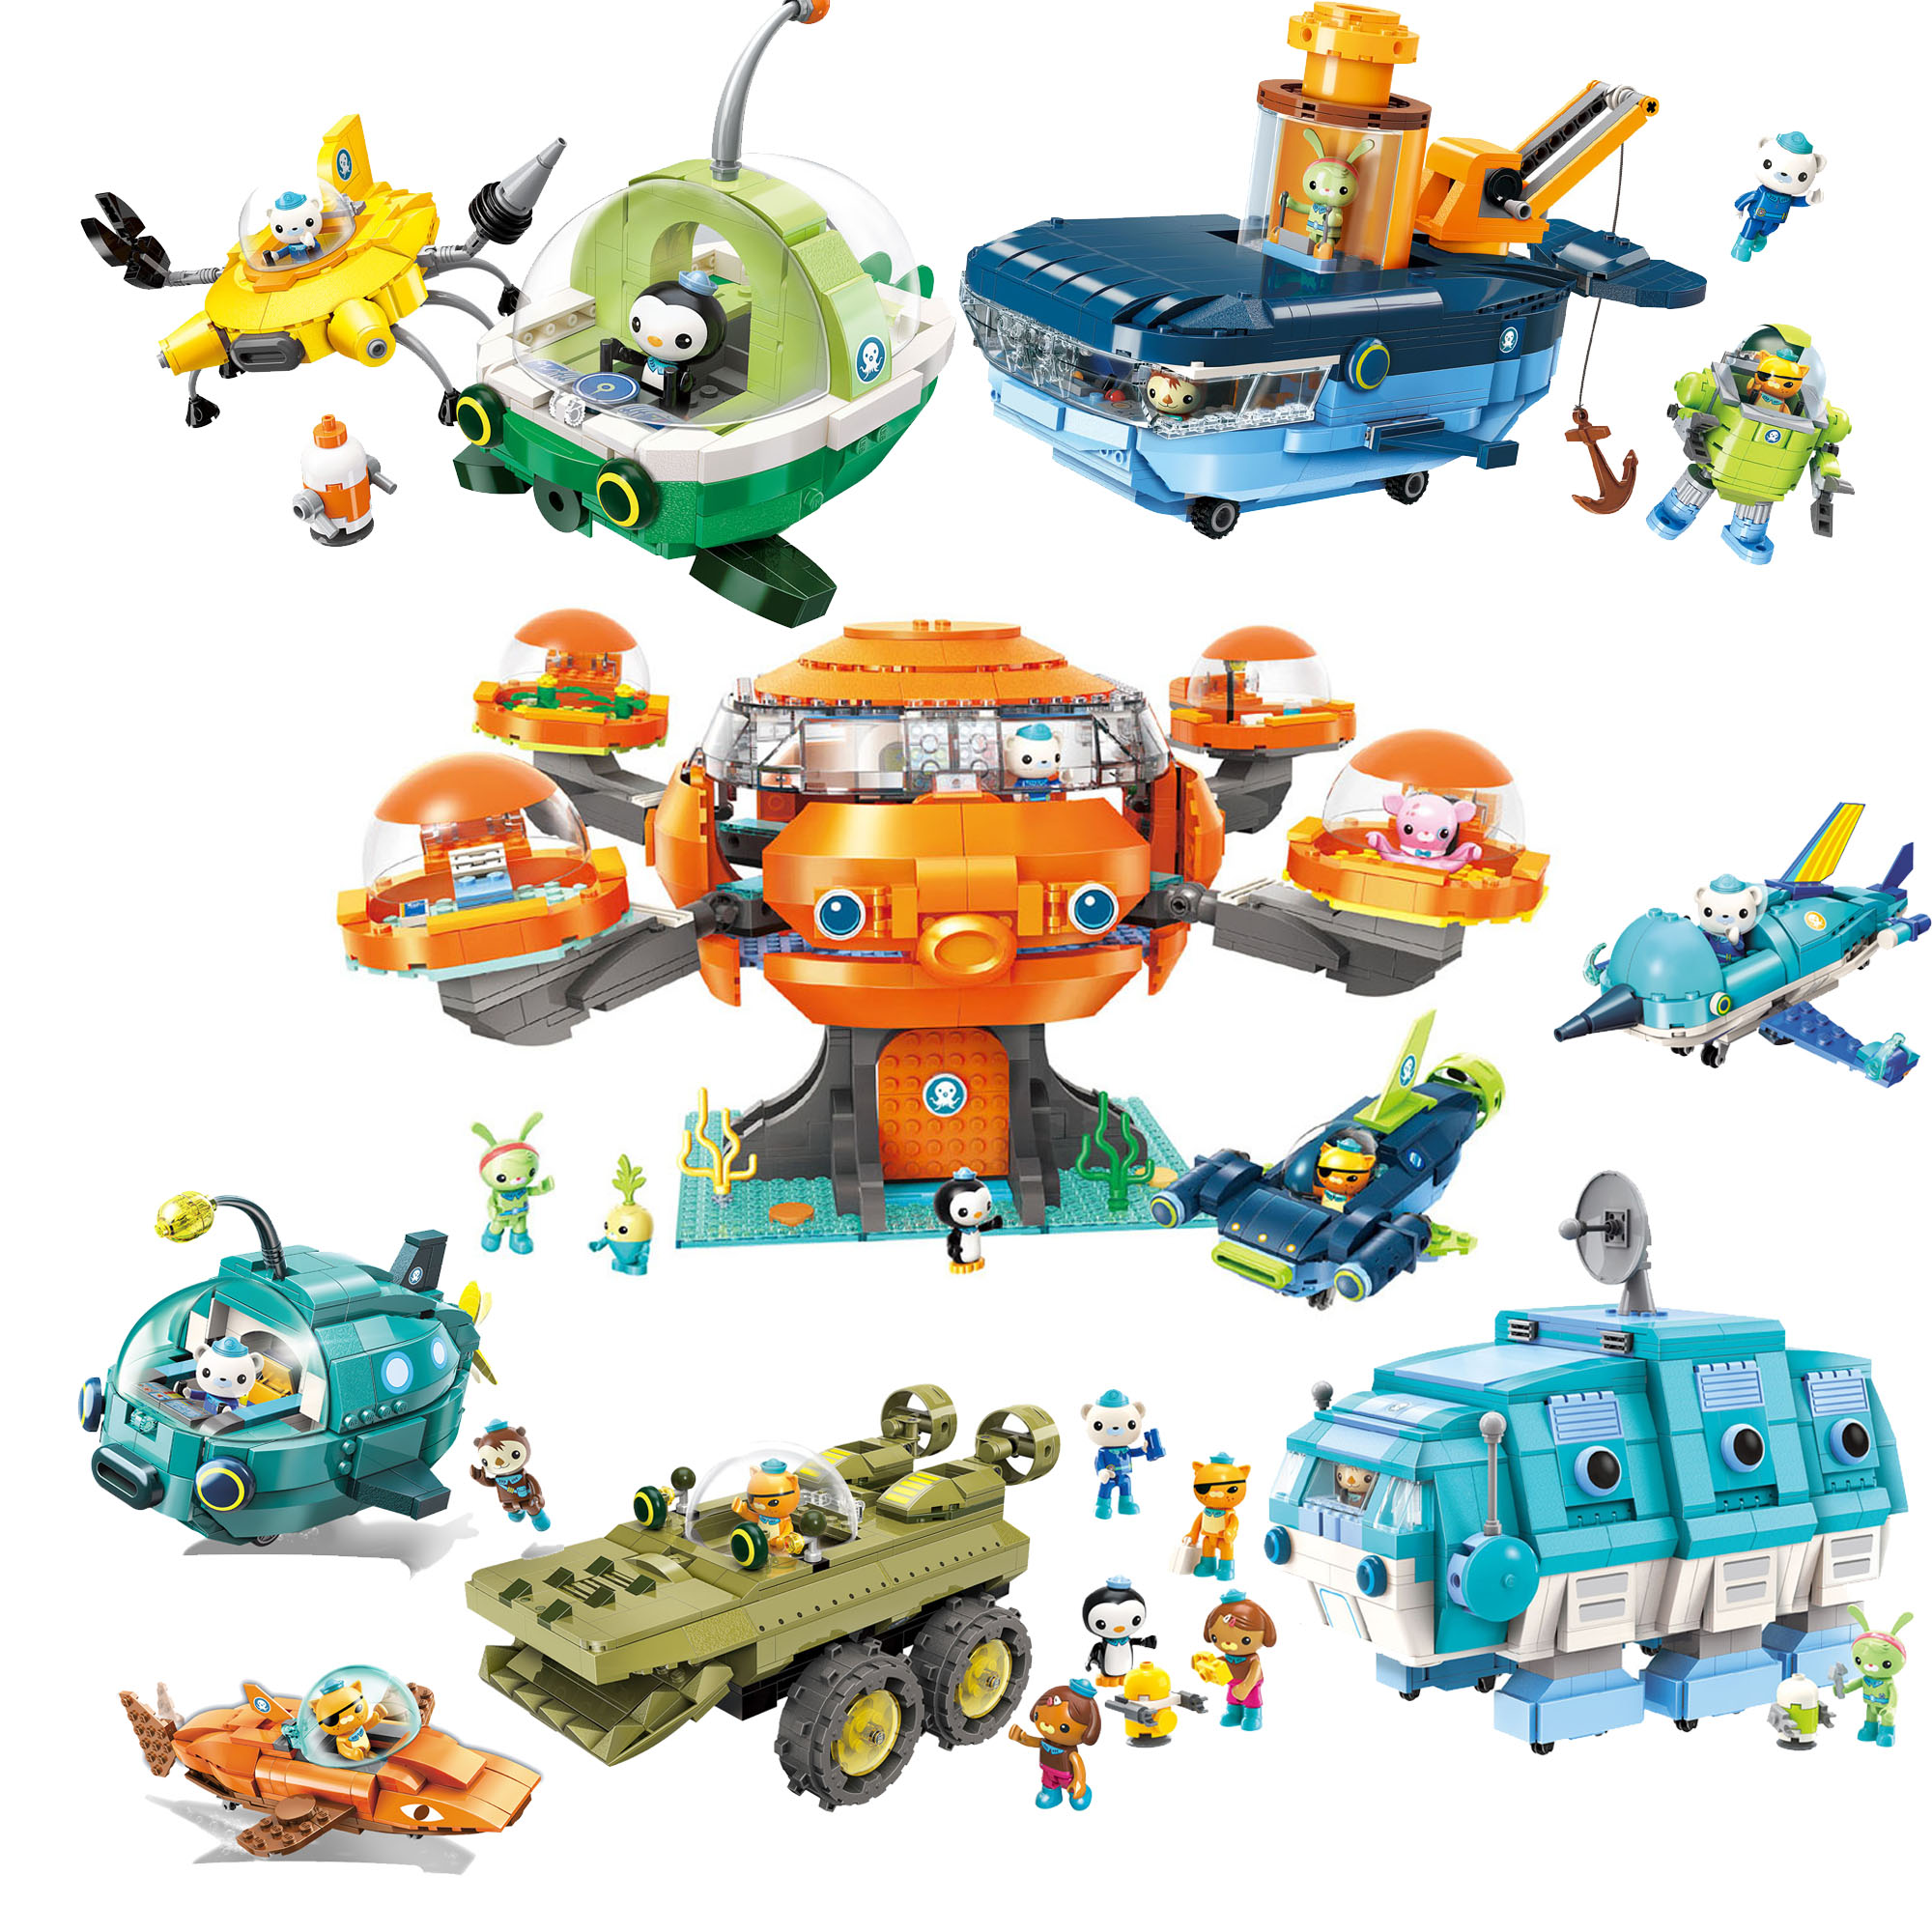 Octonauts Building Block Octopod Gup Submarine Boat Oct-Pod with GUP-C GUP-E GUP-D GUP-K GUP-I Brick set for Children Gift